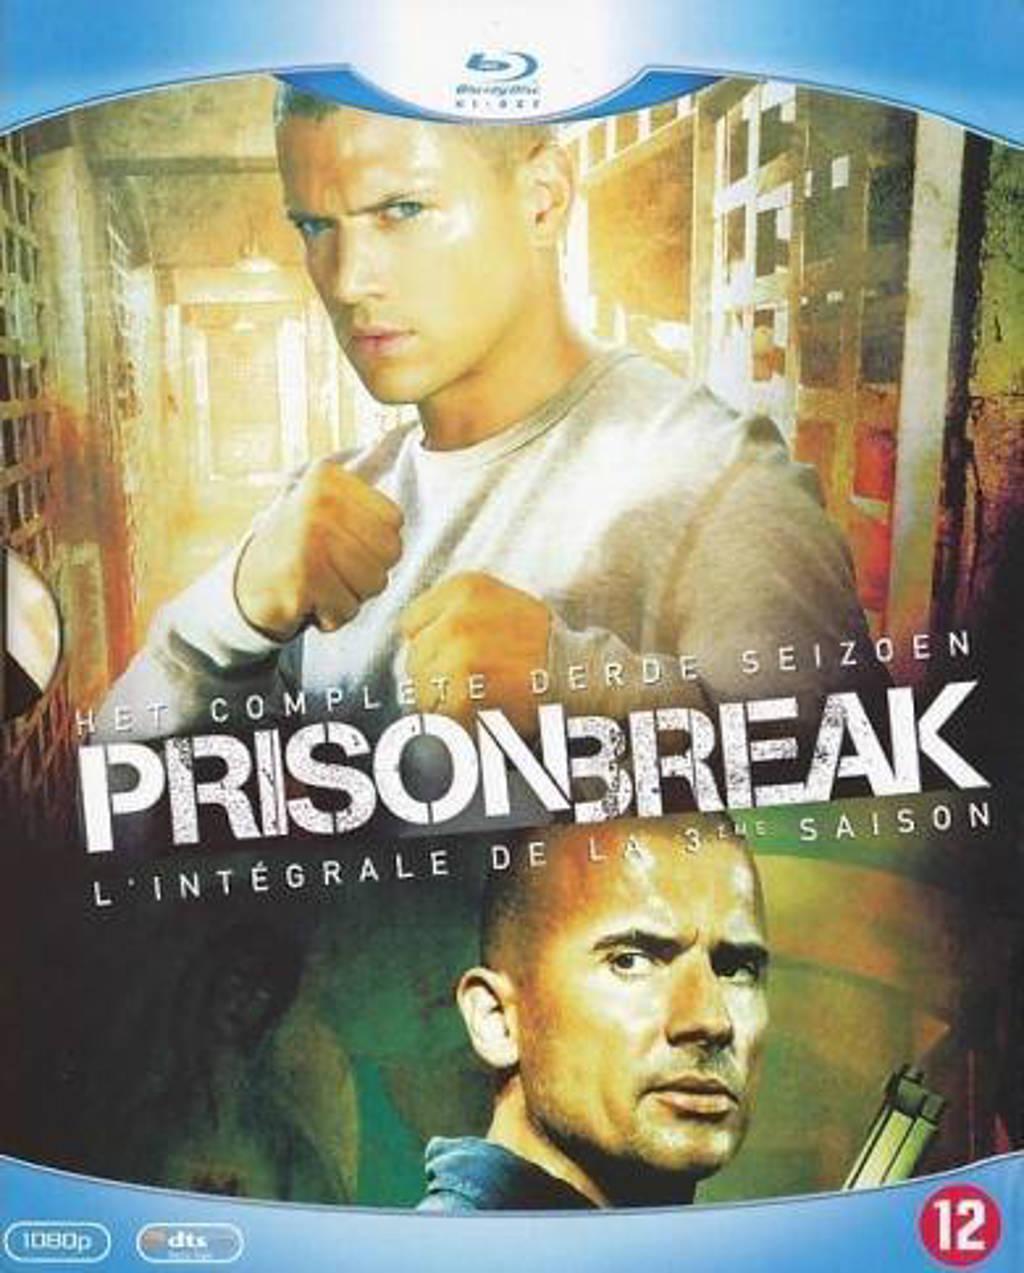 Prison break - Seizoen 3  (Blu-ray)